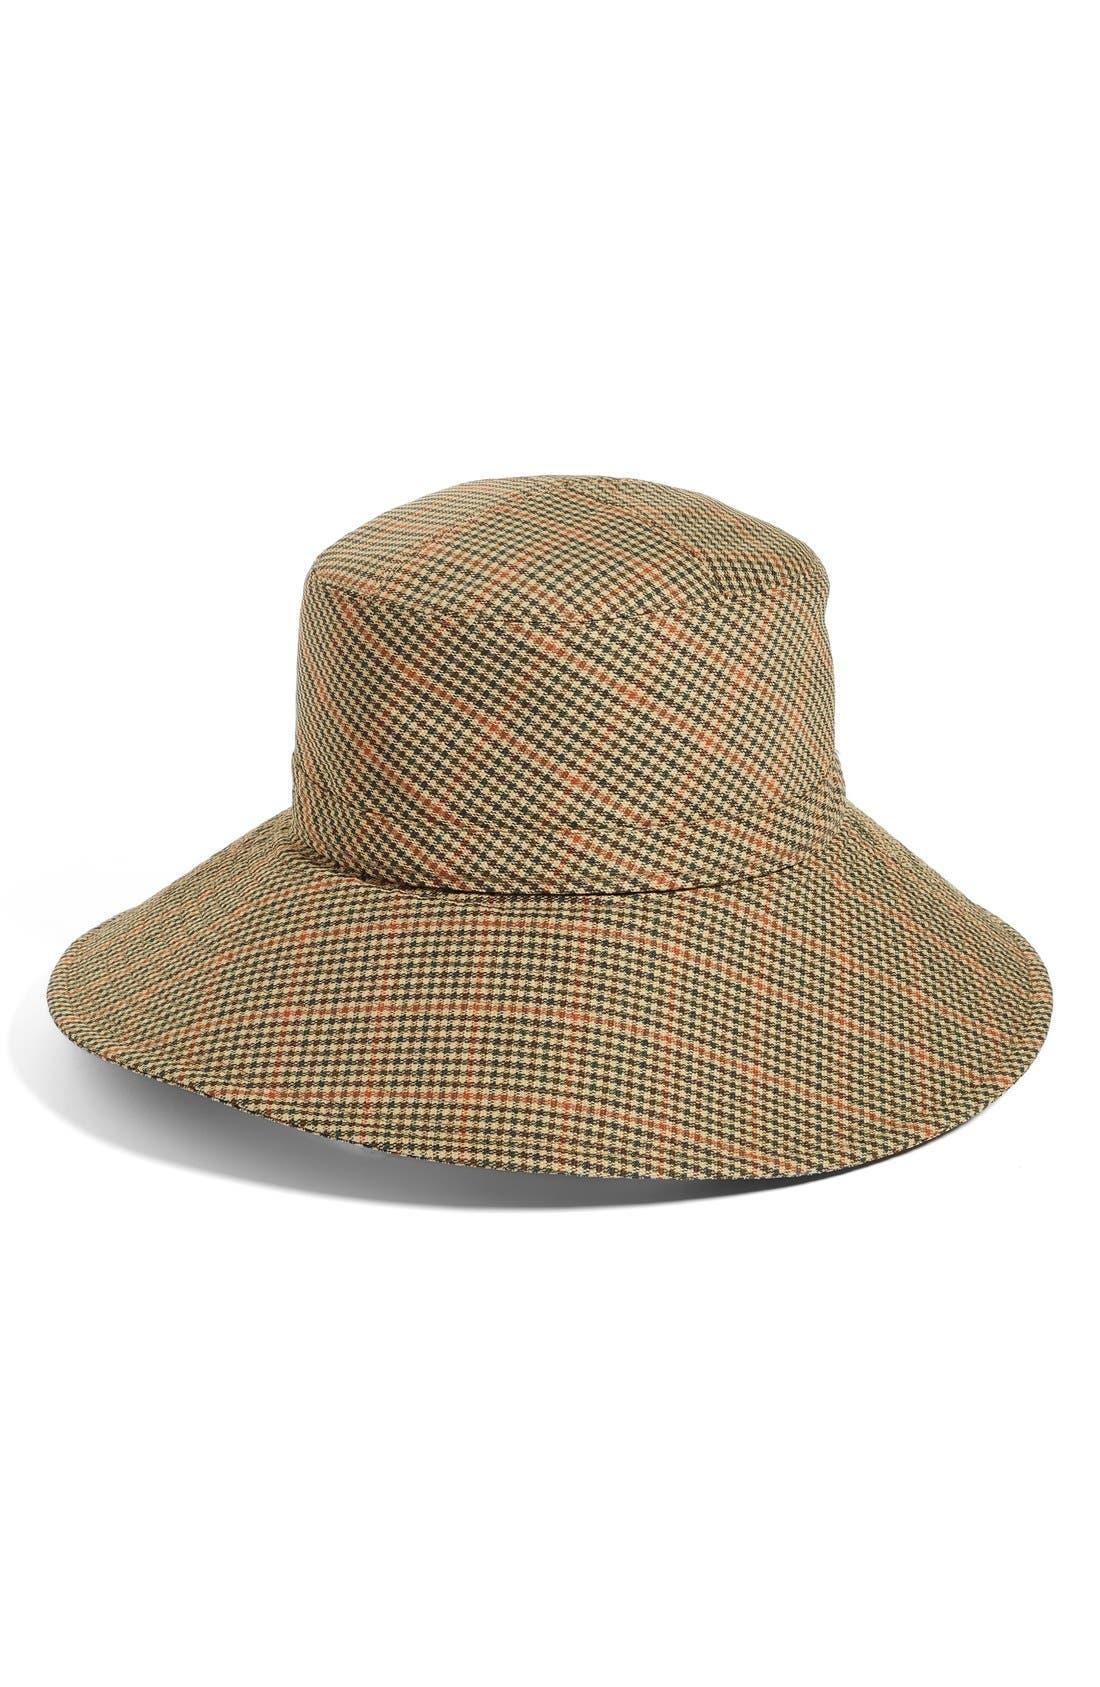 ERIC JAVITS Water Repellent Nylon Rain Hat